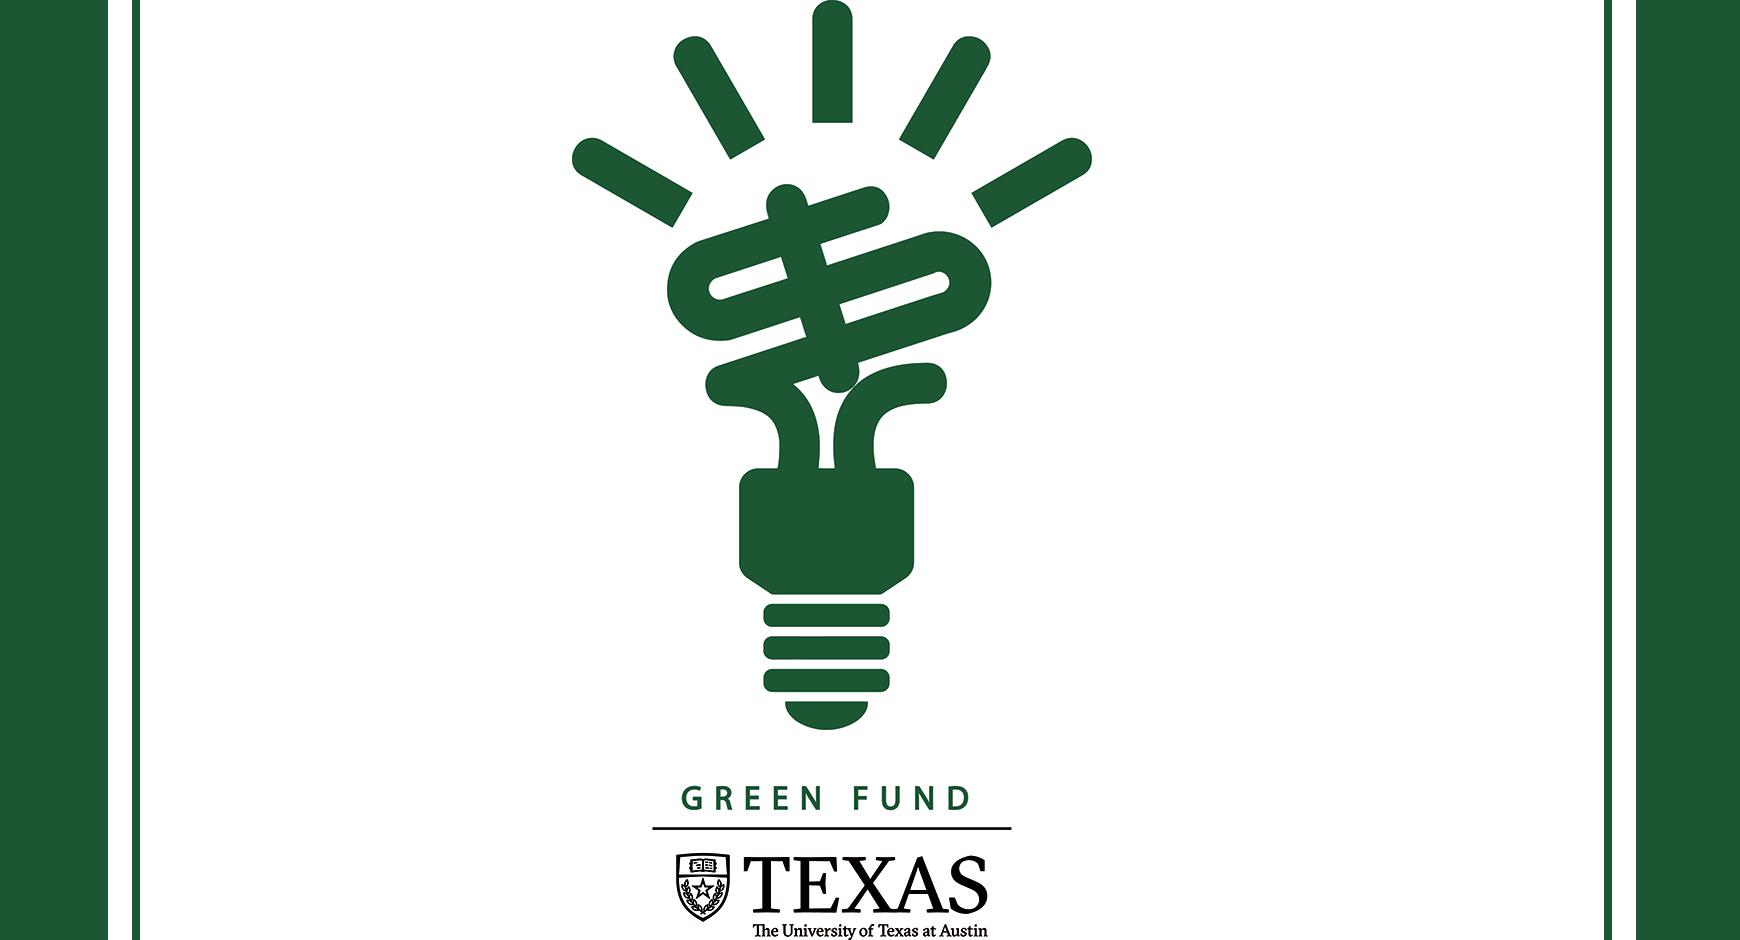 Green Fund, University of Texas at Austin